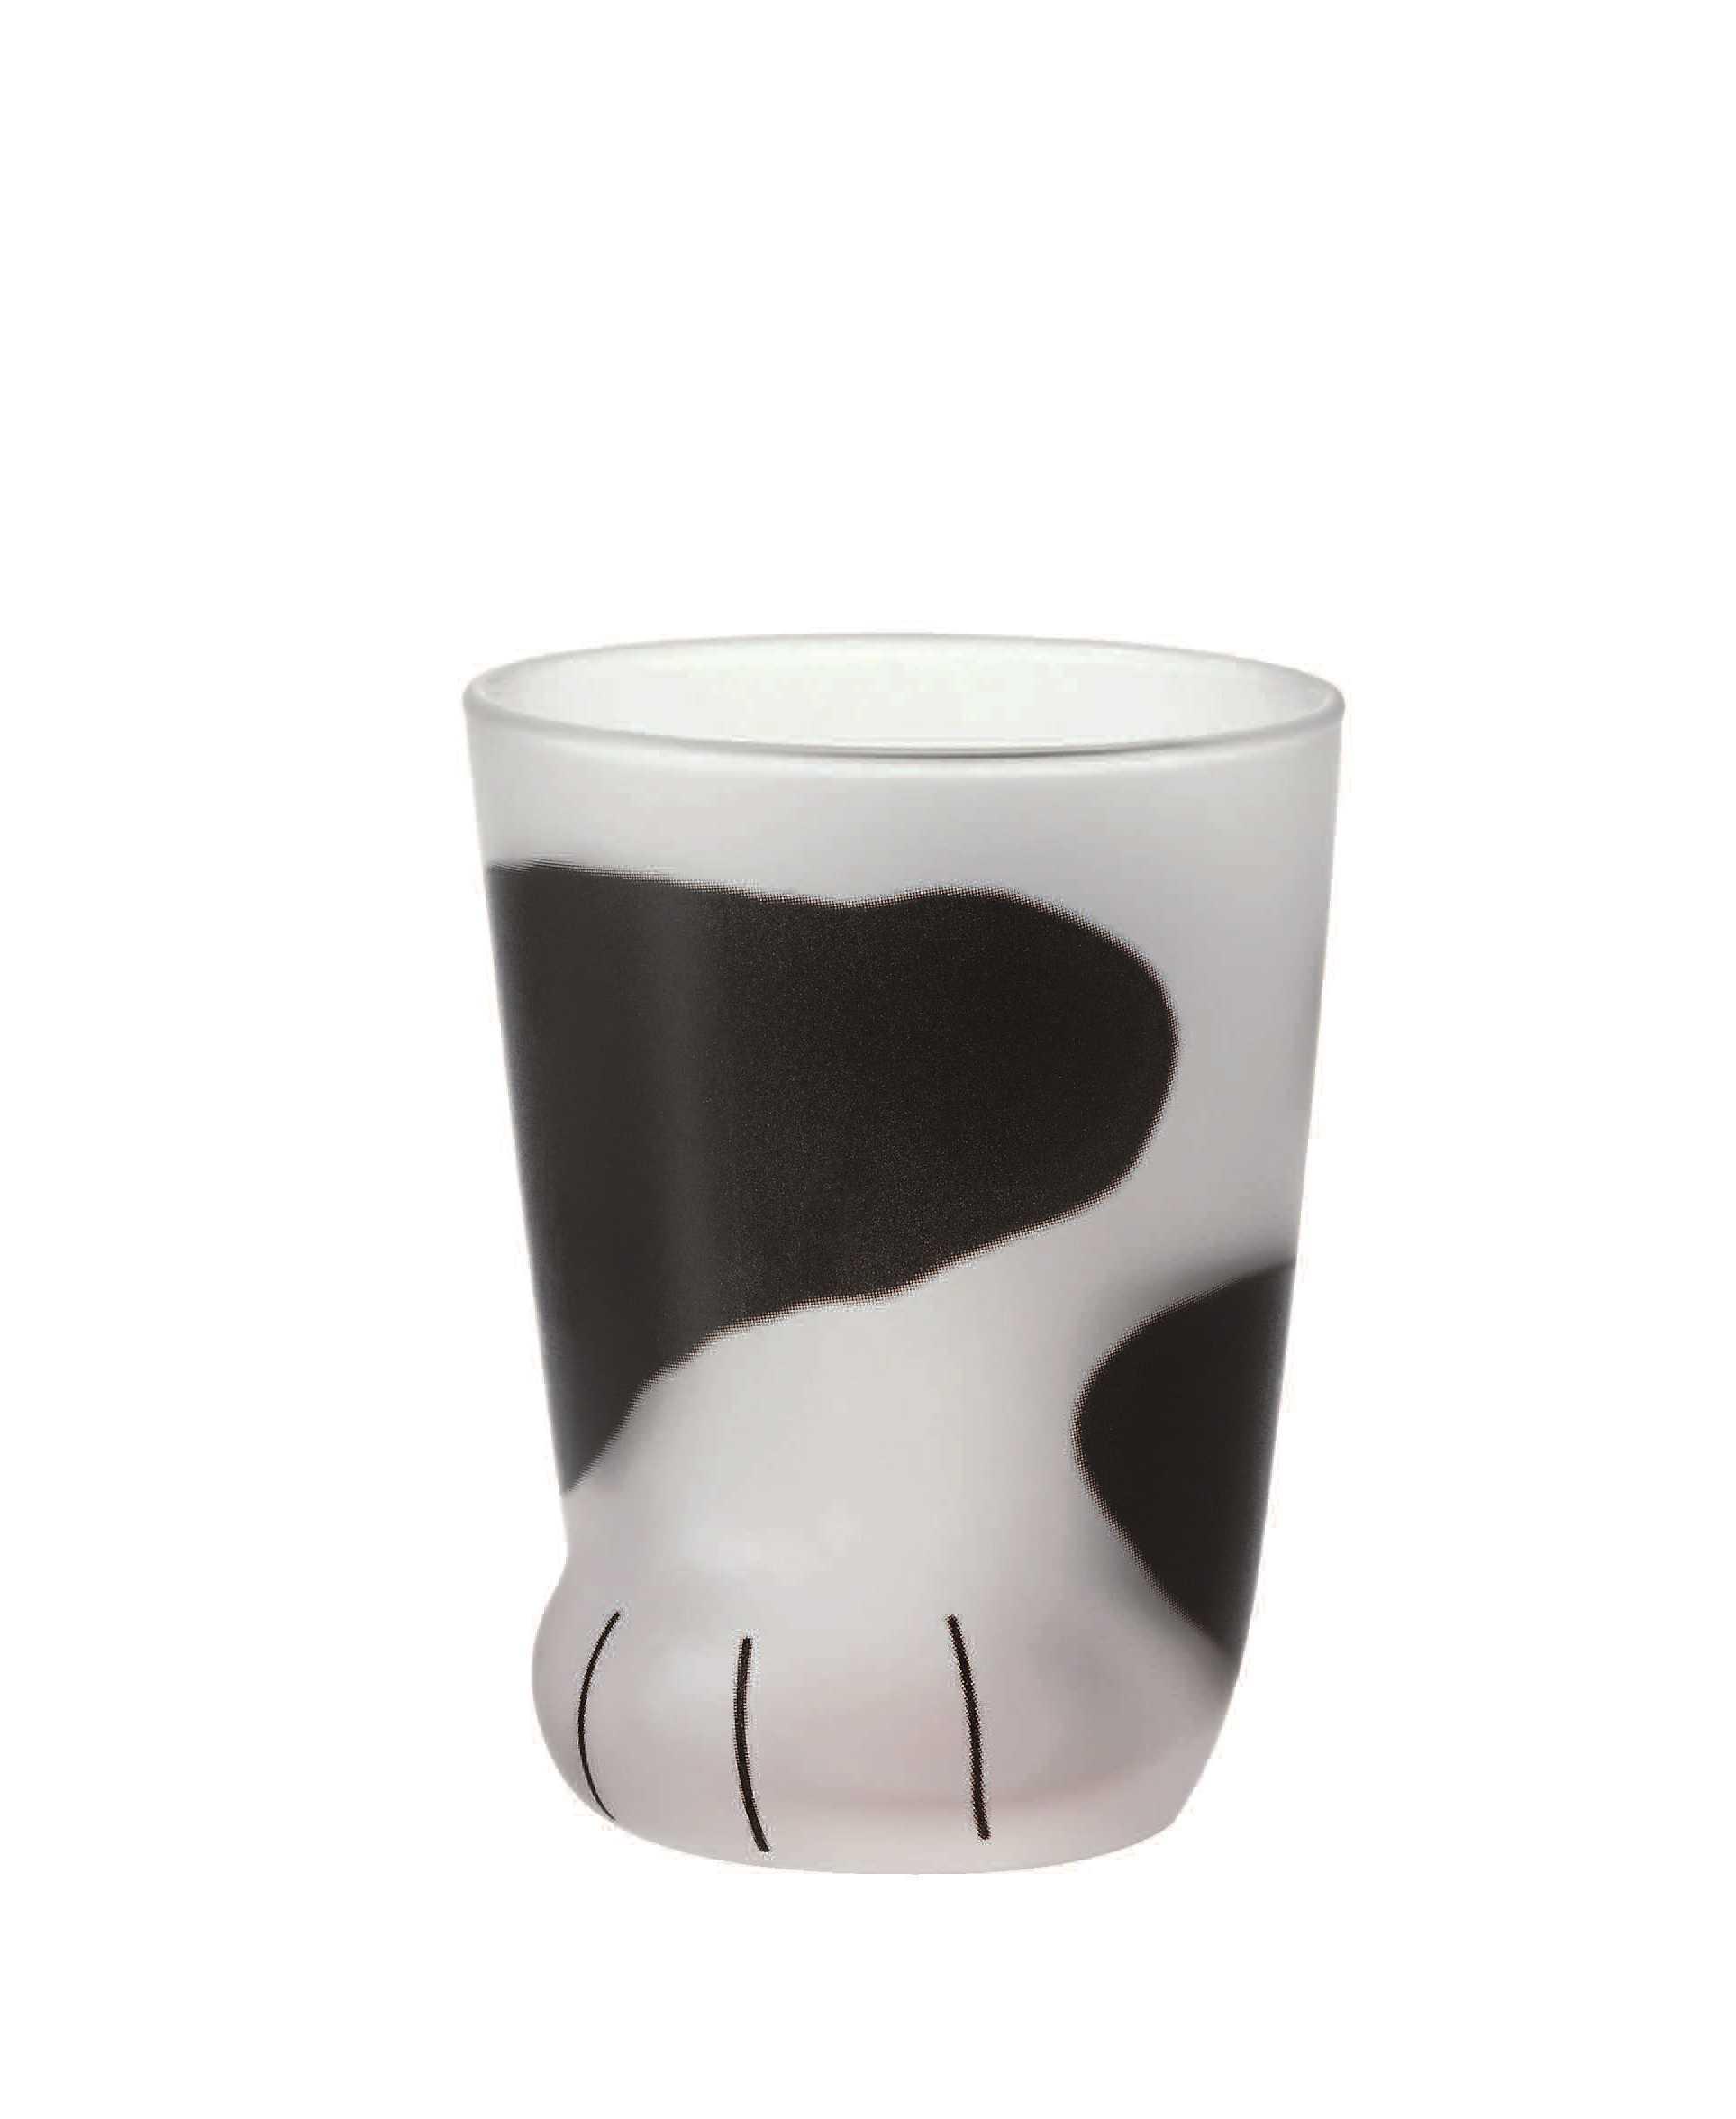 Aderia Coconeco系列猫脚玻璃杯230ml(黑白猫)6678